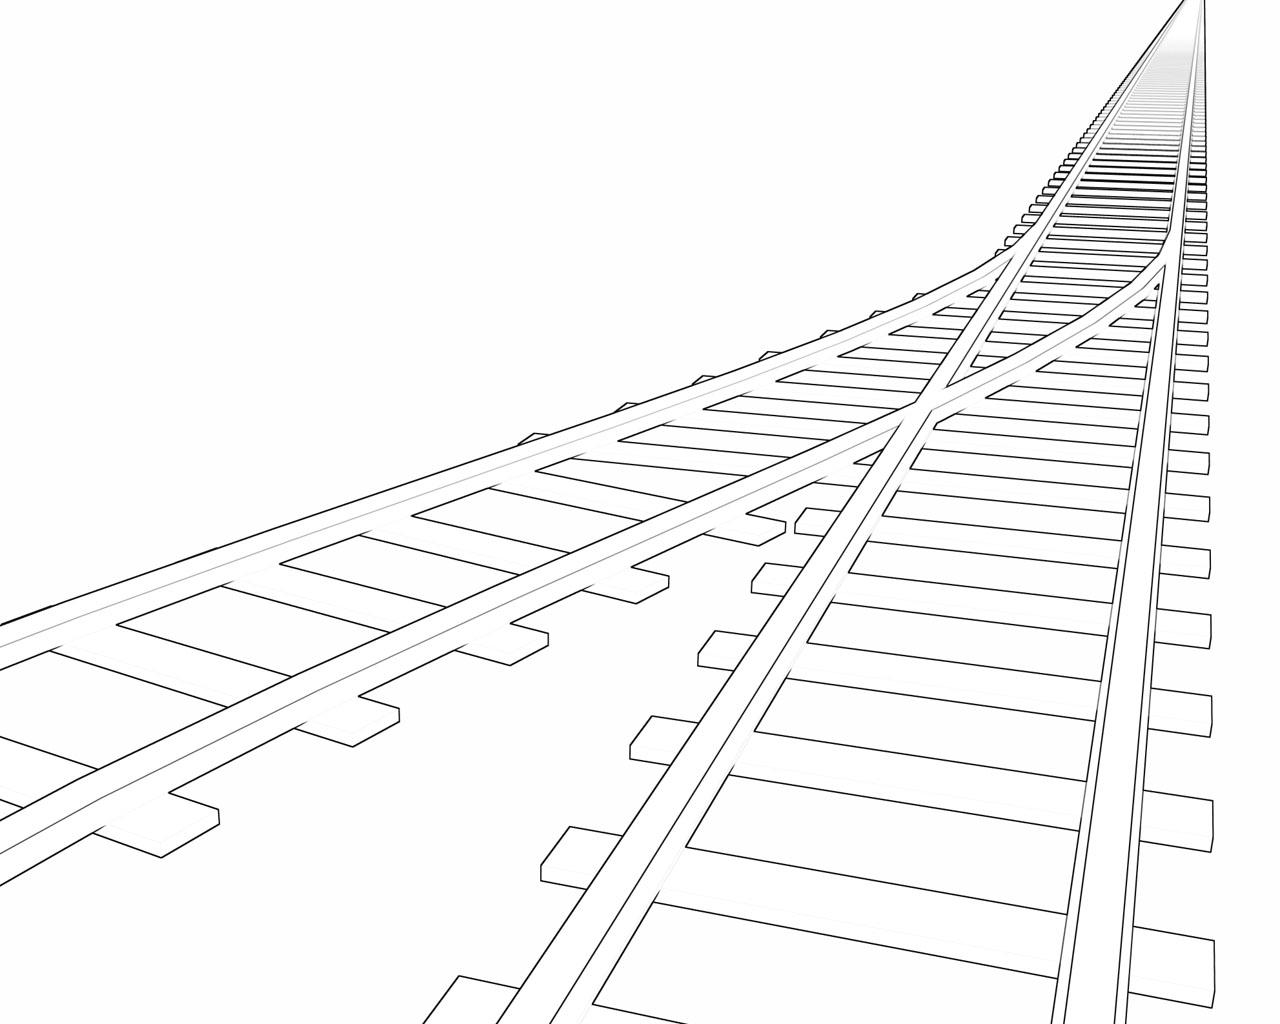 Railroad Track Drawing At Getdrawings